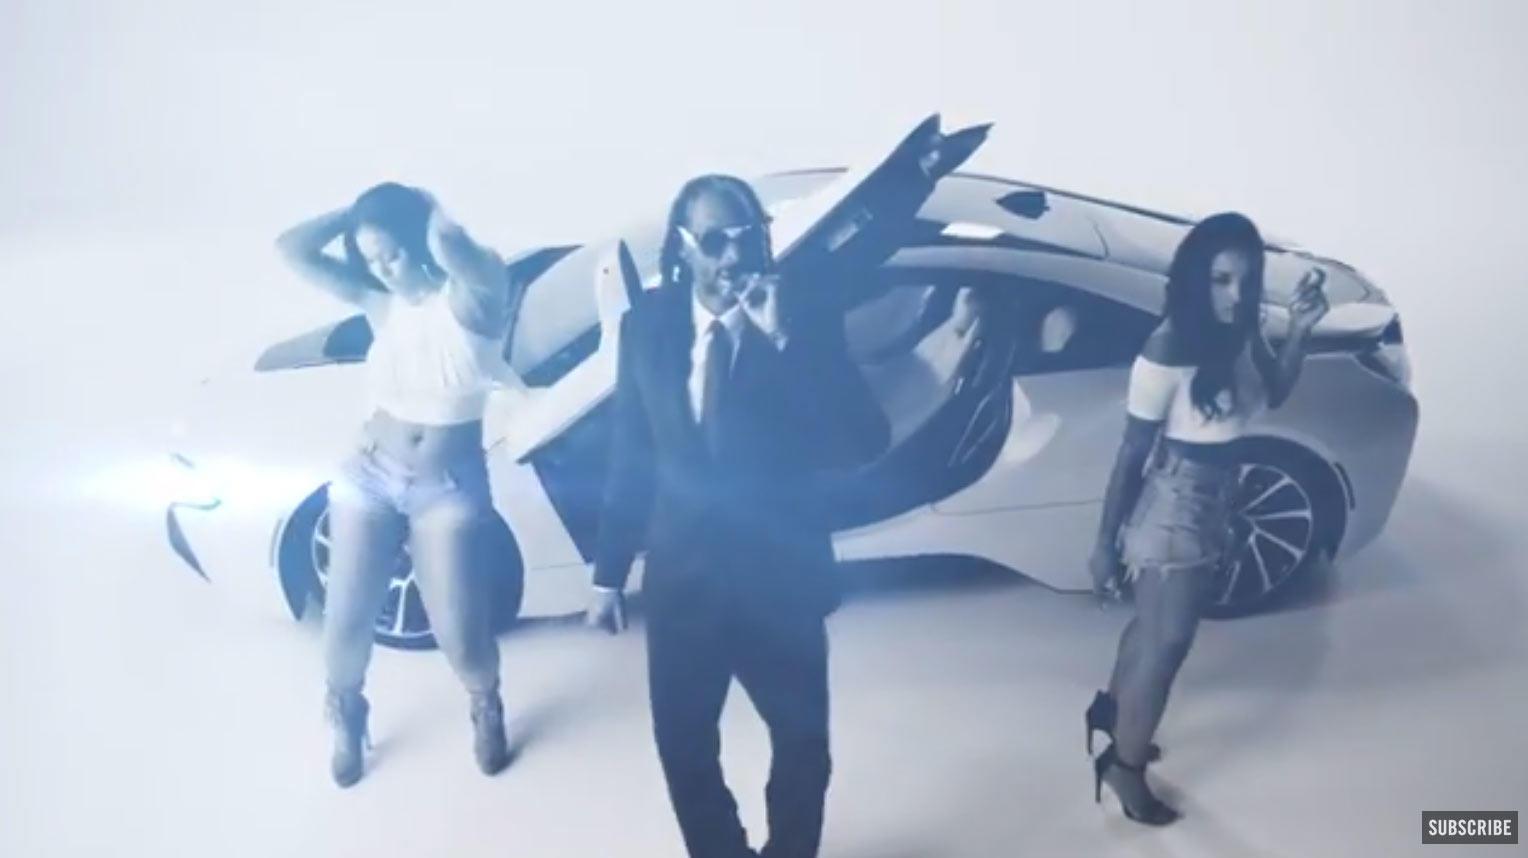 Watch: Snoop Dogg's New Smoker's Anthem 'Kush Ups' Featuring Wiz Khalifa